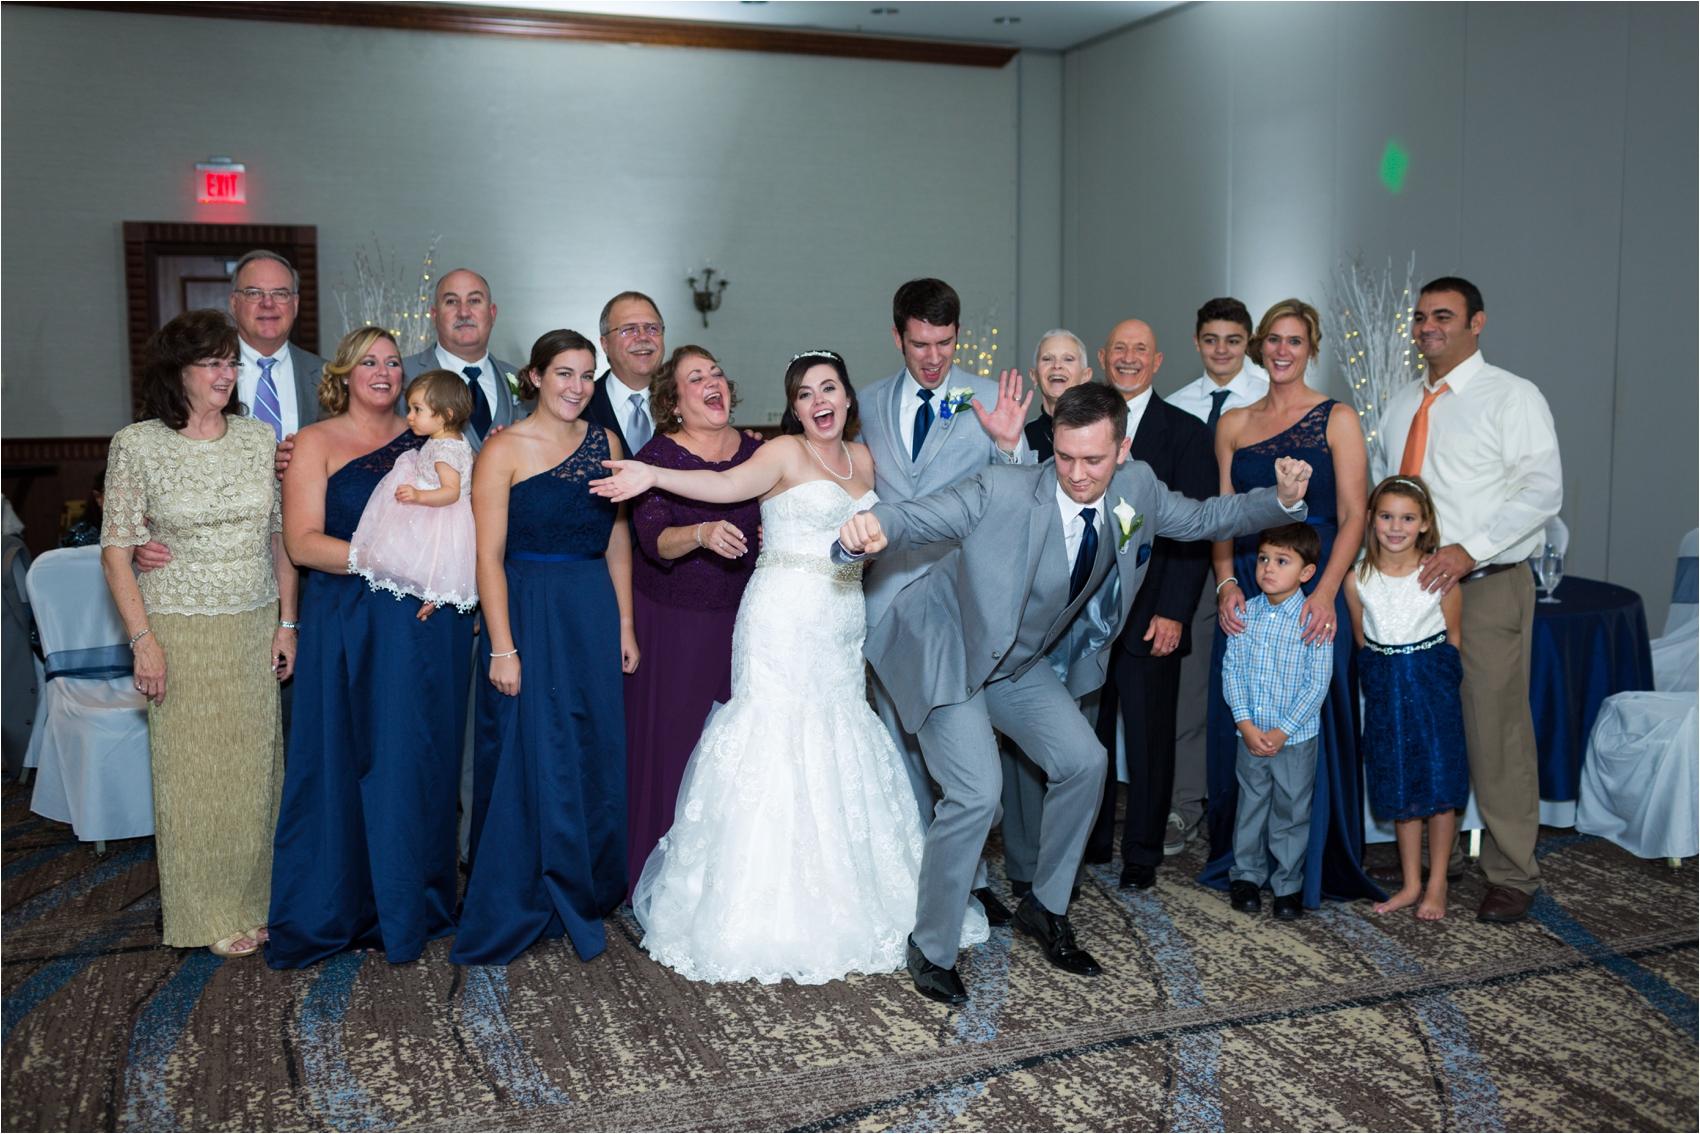 Newport-News-Winter-Wonderland-Wedding_0230.jpg